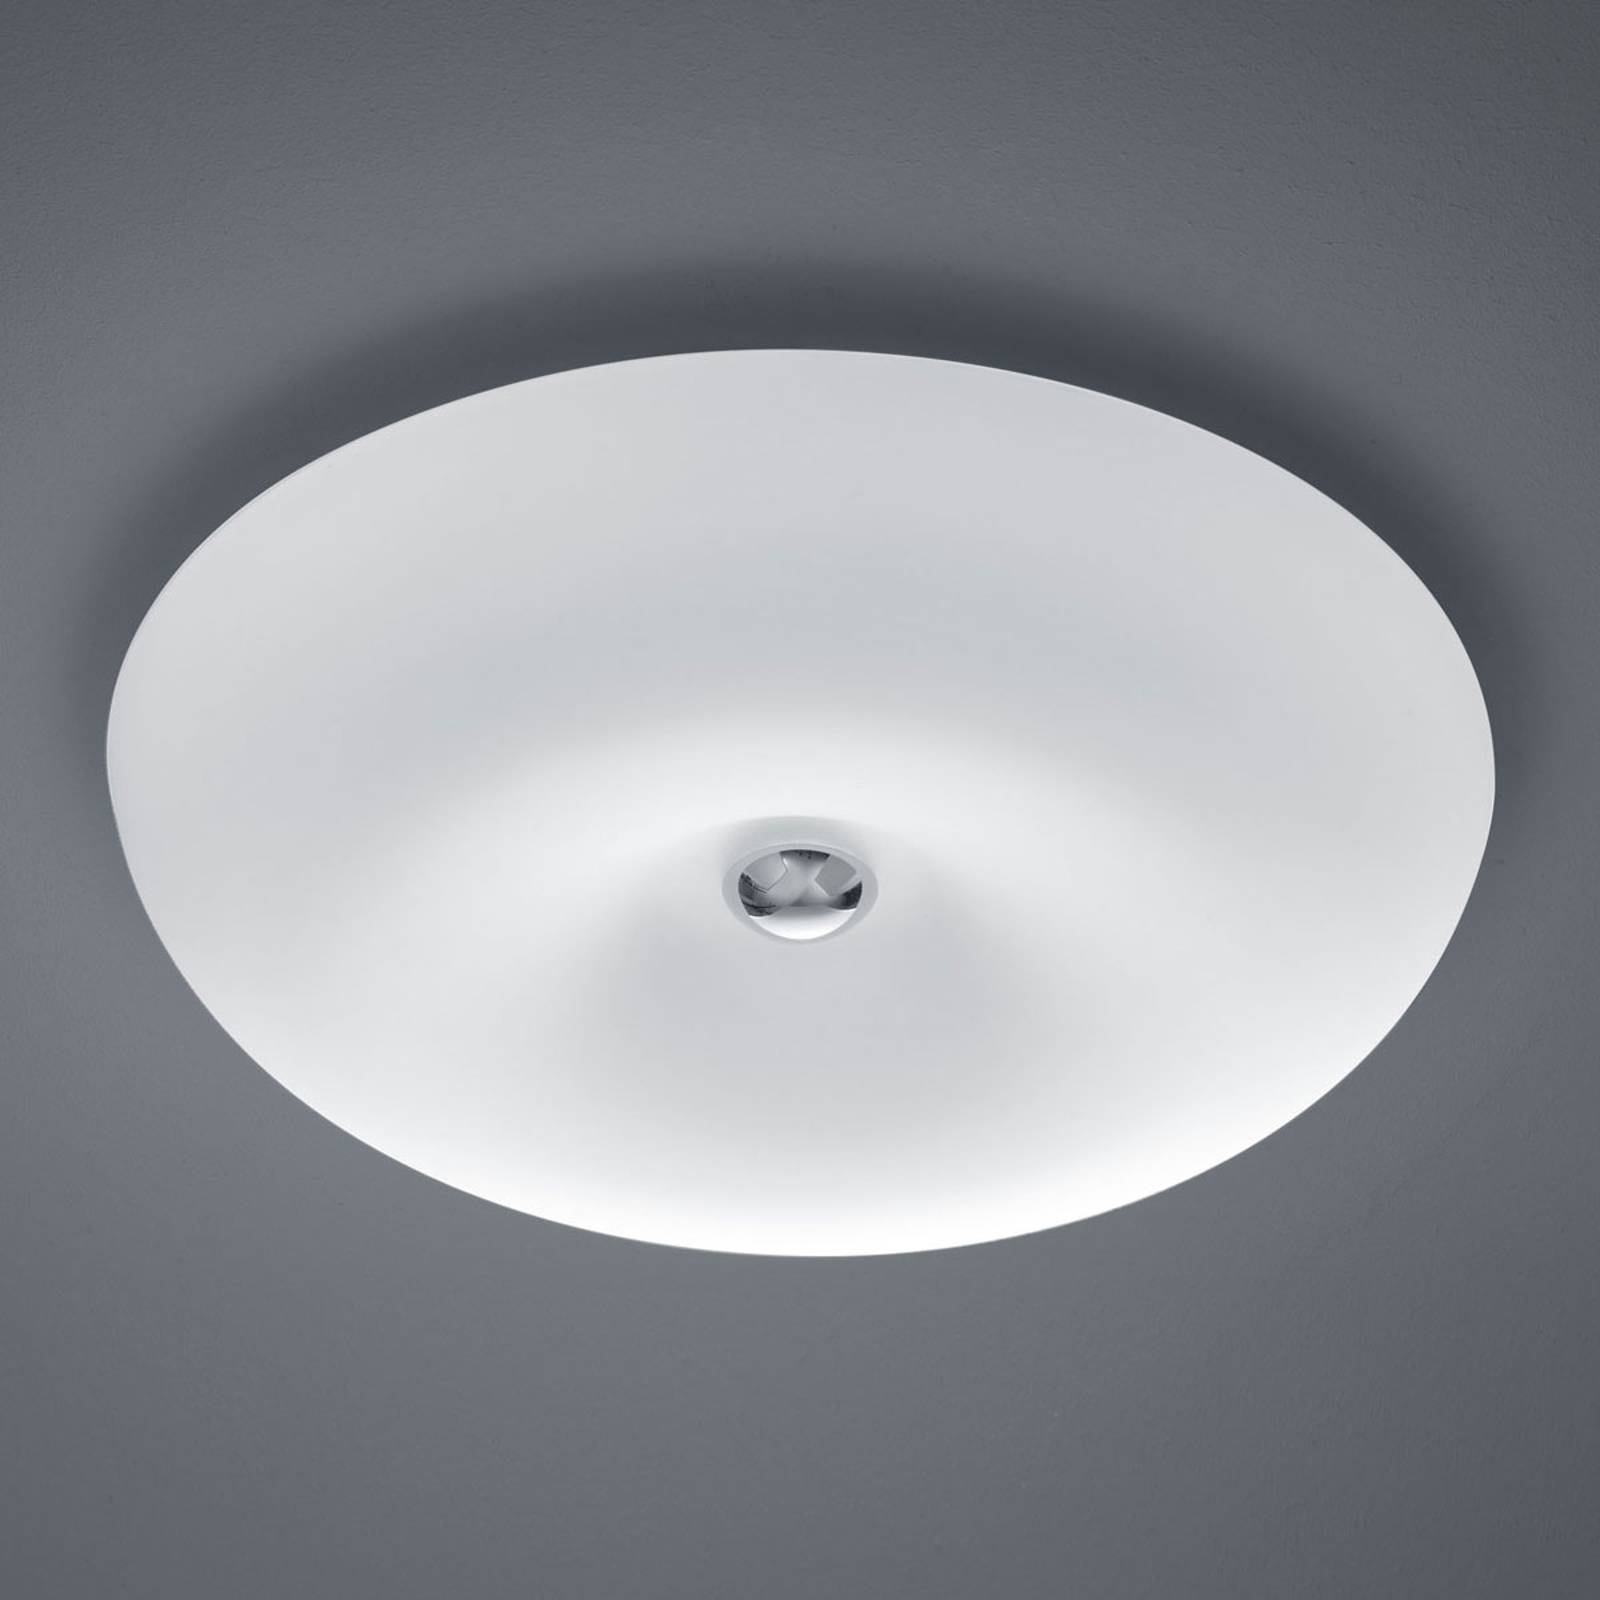 BANKAMP Vanity plafonnier LED verre, nickel